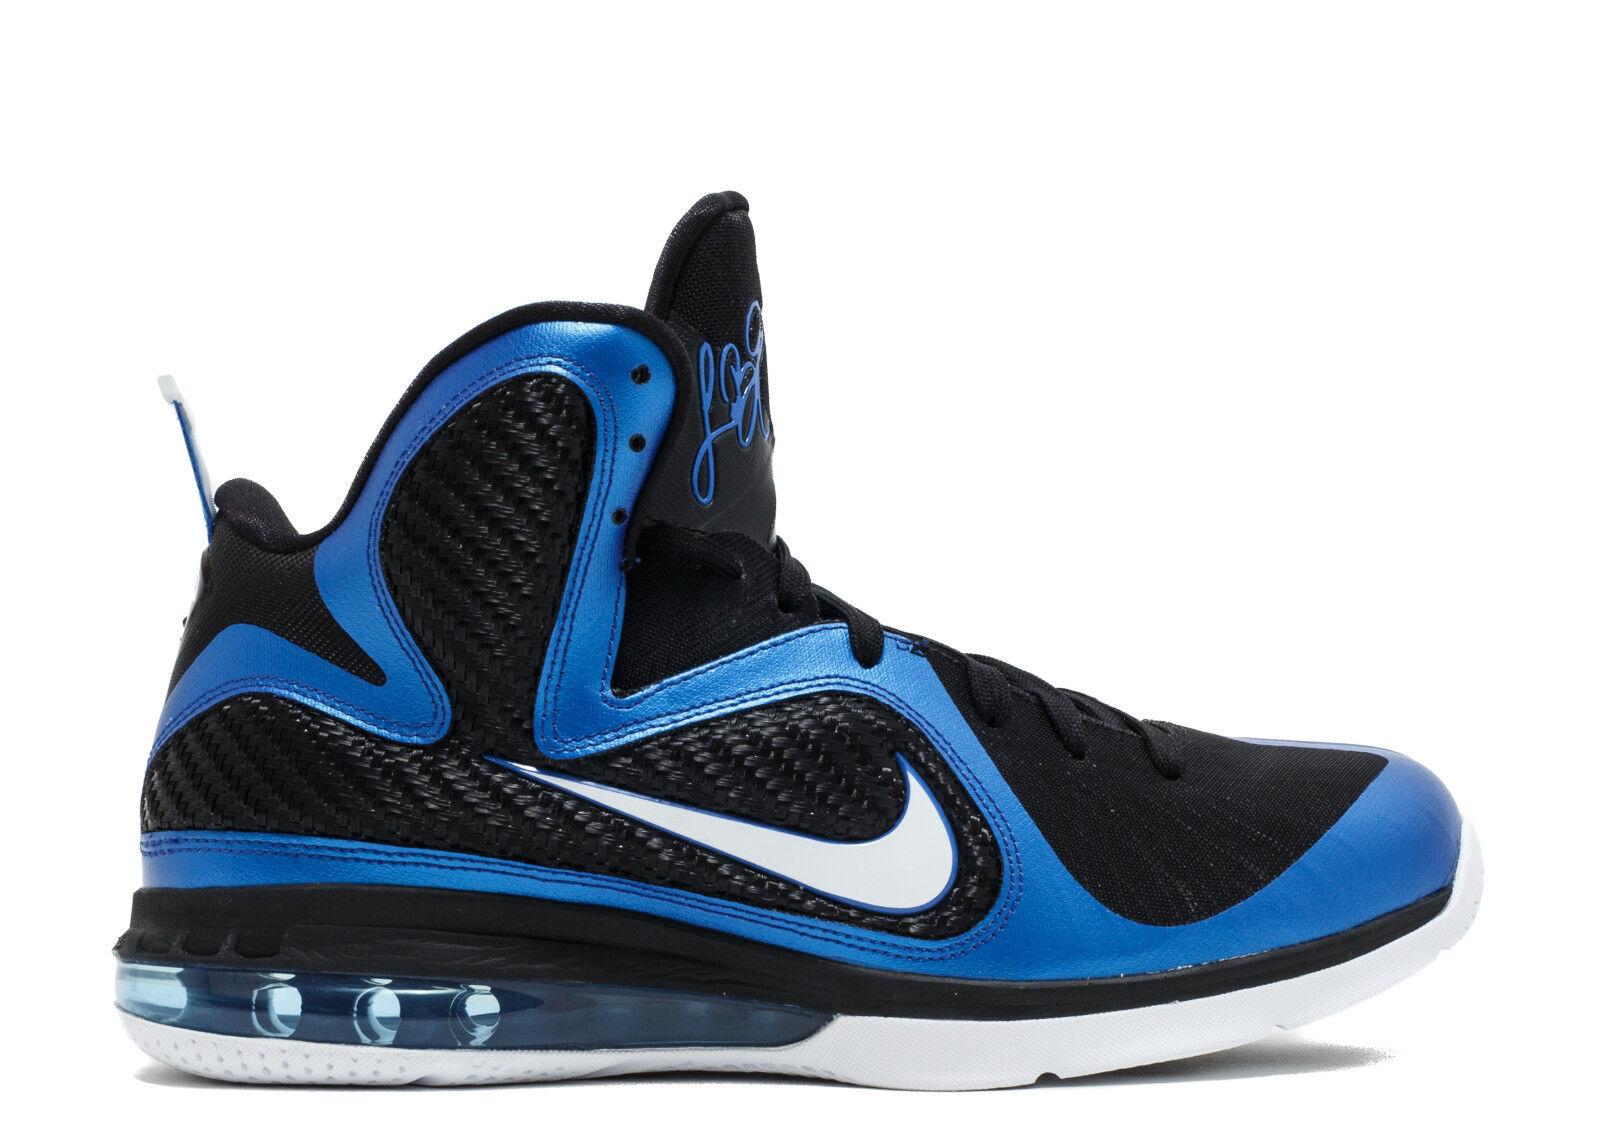 Nike LeBron 9 IX Black Blue Kentucky Wildcats PE Size 13. 469764-400